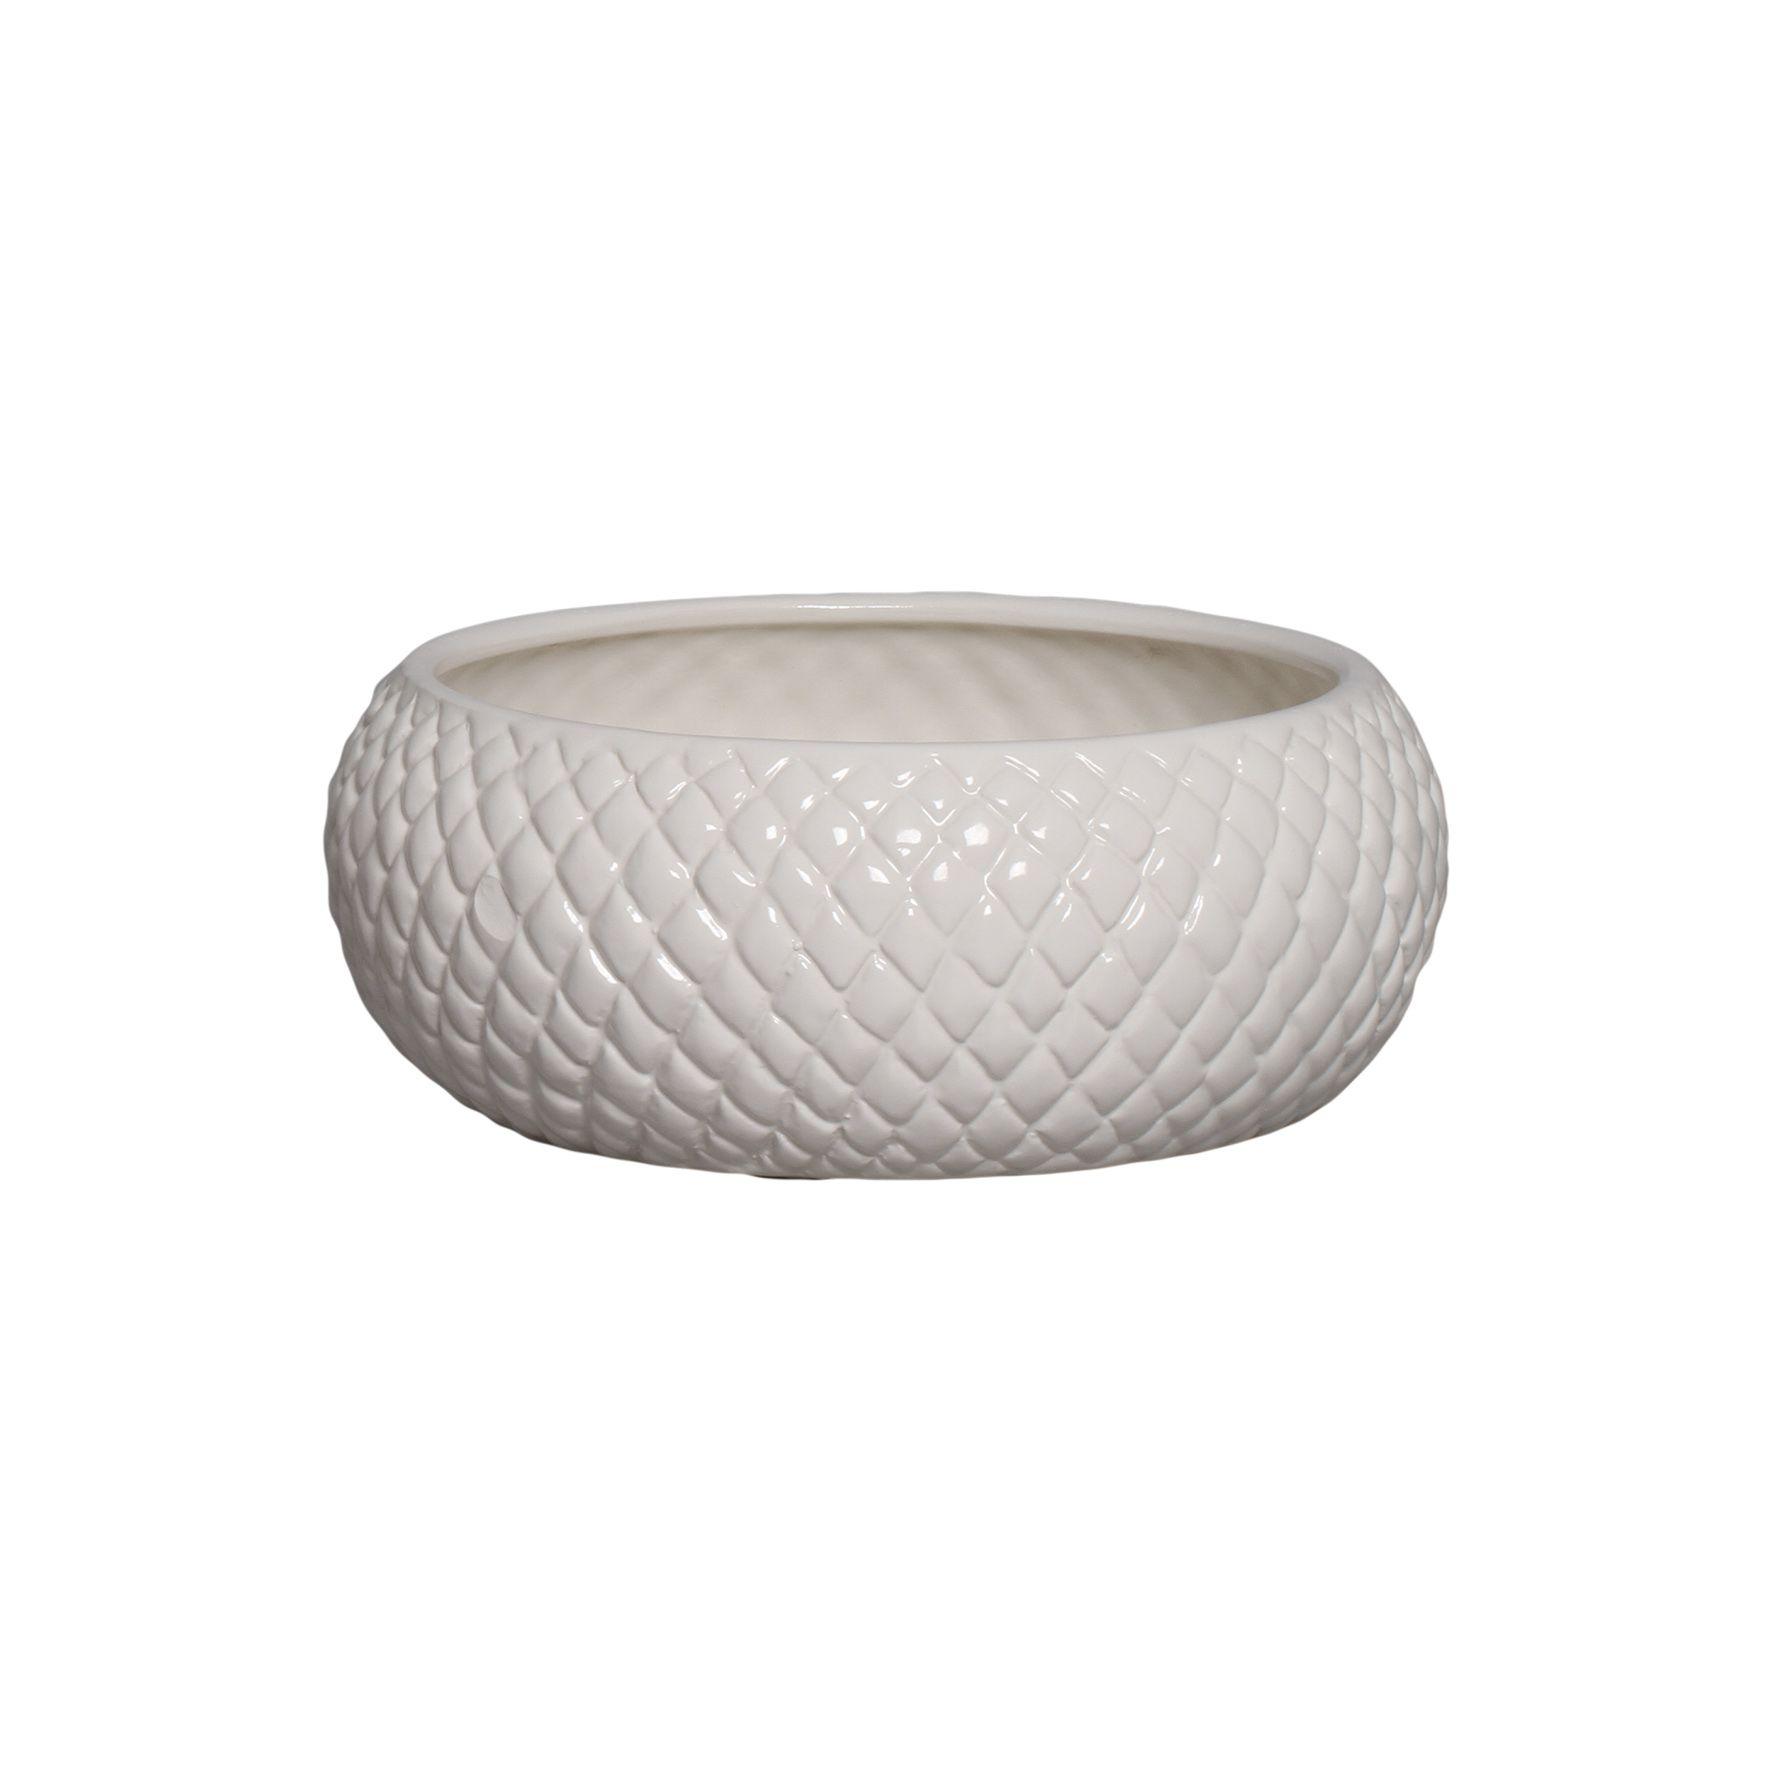 Cachepot de Cerâmica Crema Claro Boca Larga P 10x25,5 cm